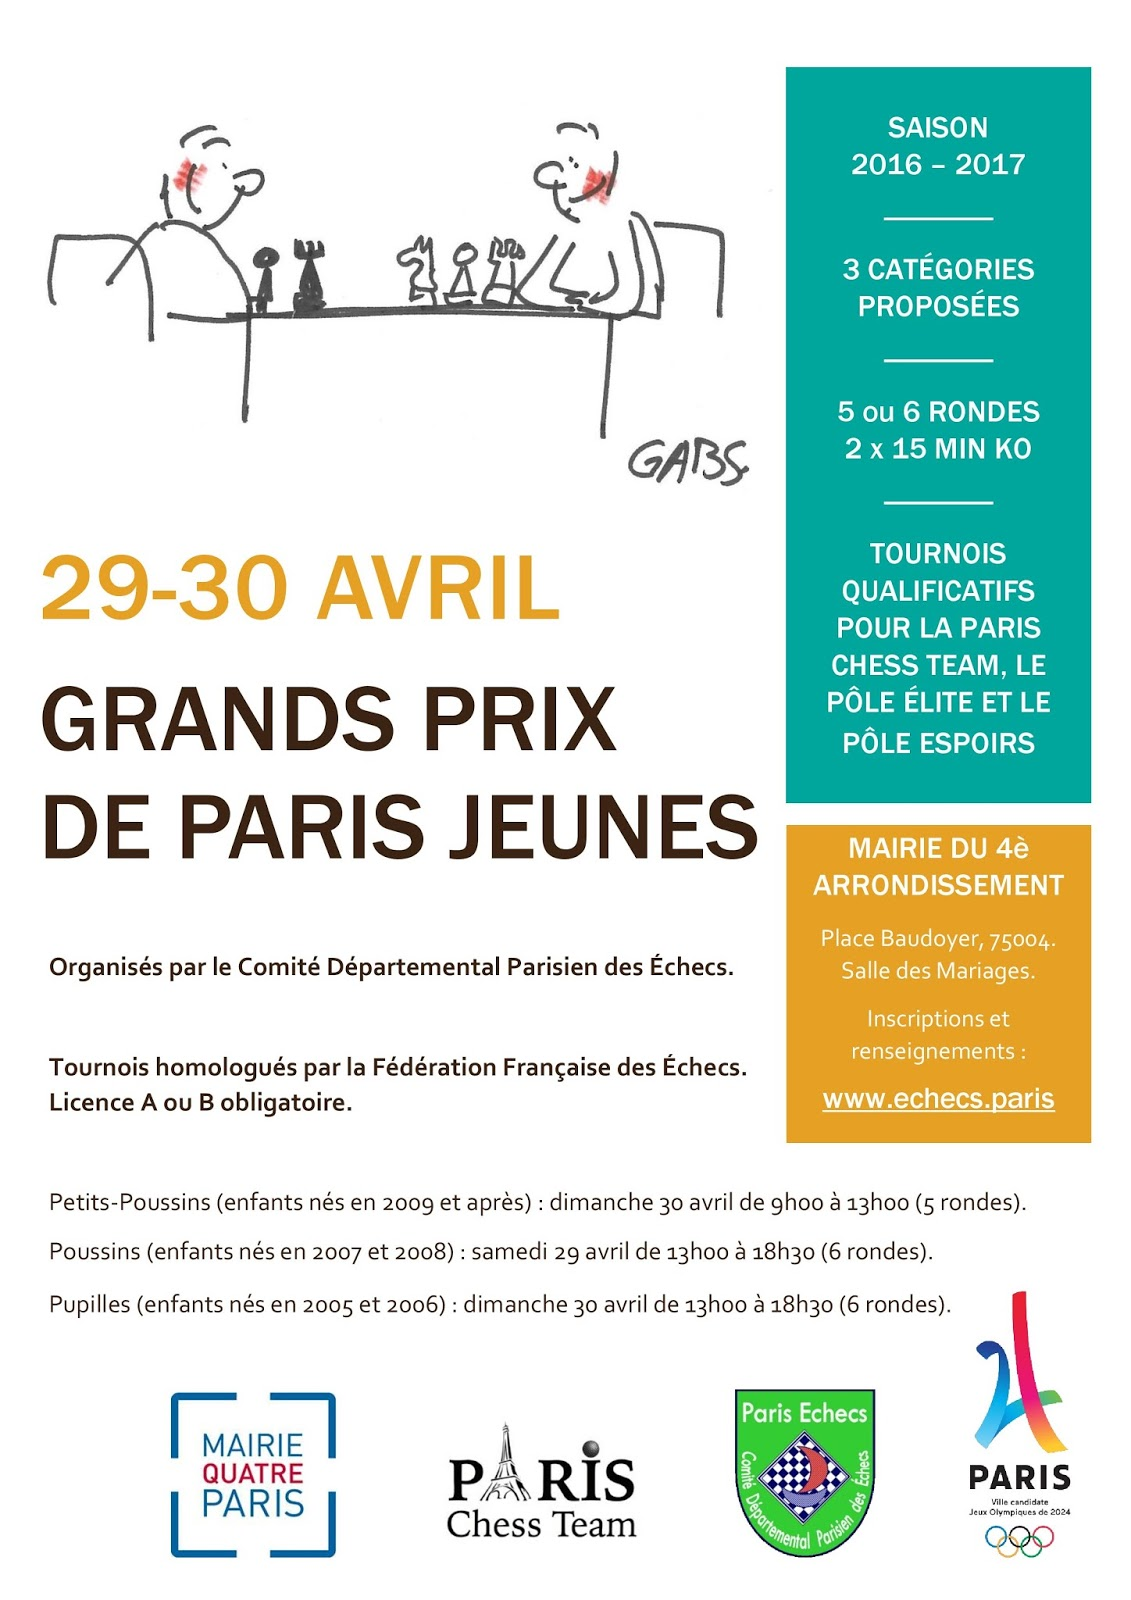 canal saint martin echecs les grands prix jeunes de paris. Black Bedroom Furniture Sets. Home Design Ideas